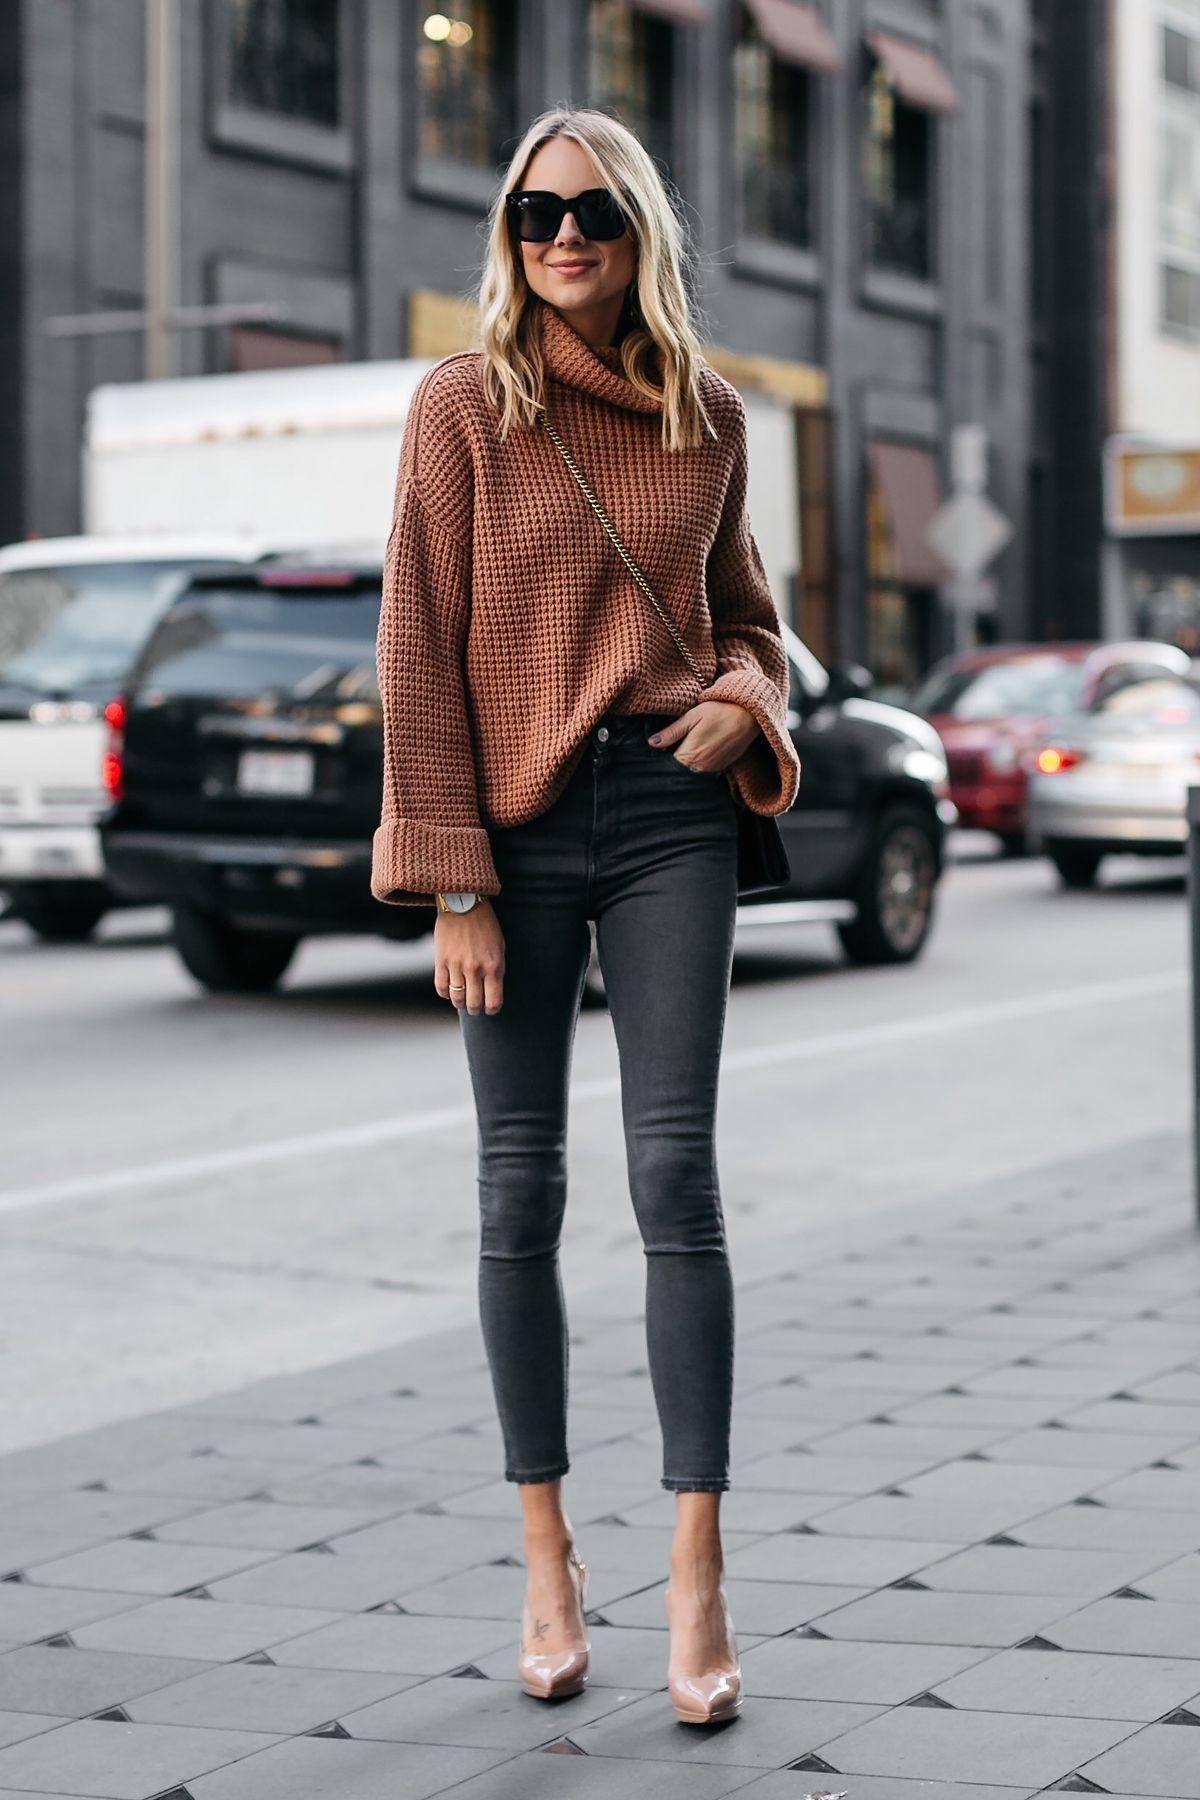 b152e8263b0 Fashion Jackson Oversized Sweater Free People Park City Pullover Tan Sweater  Grey Skinny Jeans Chrisitian Louboutin Nude Pumps